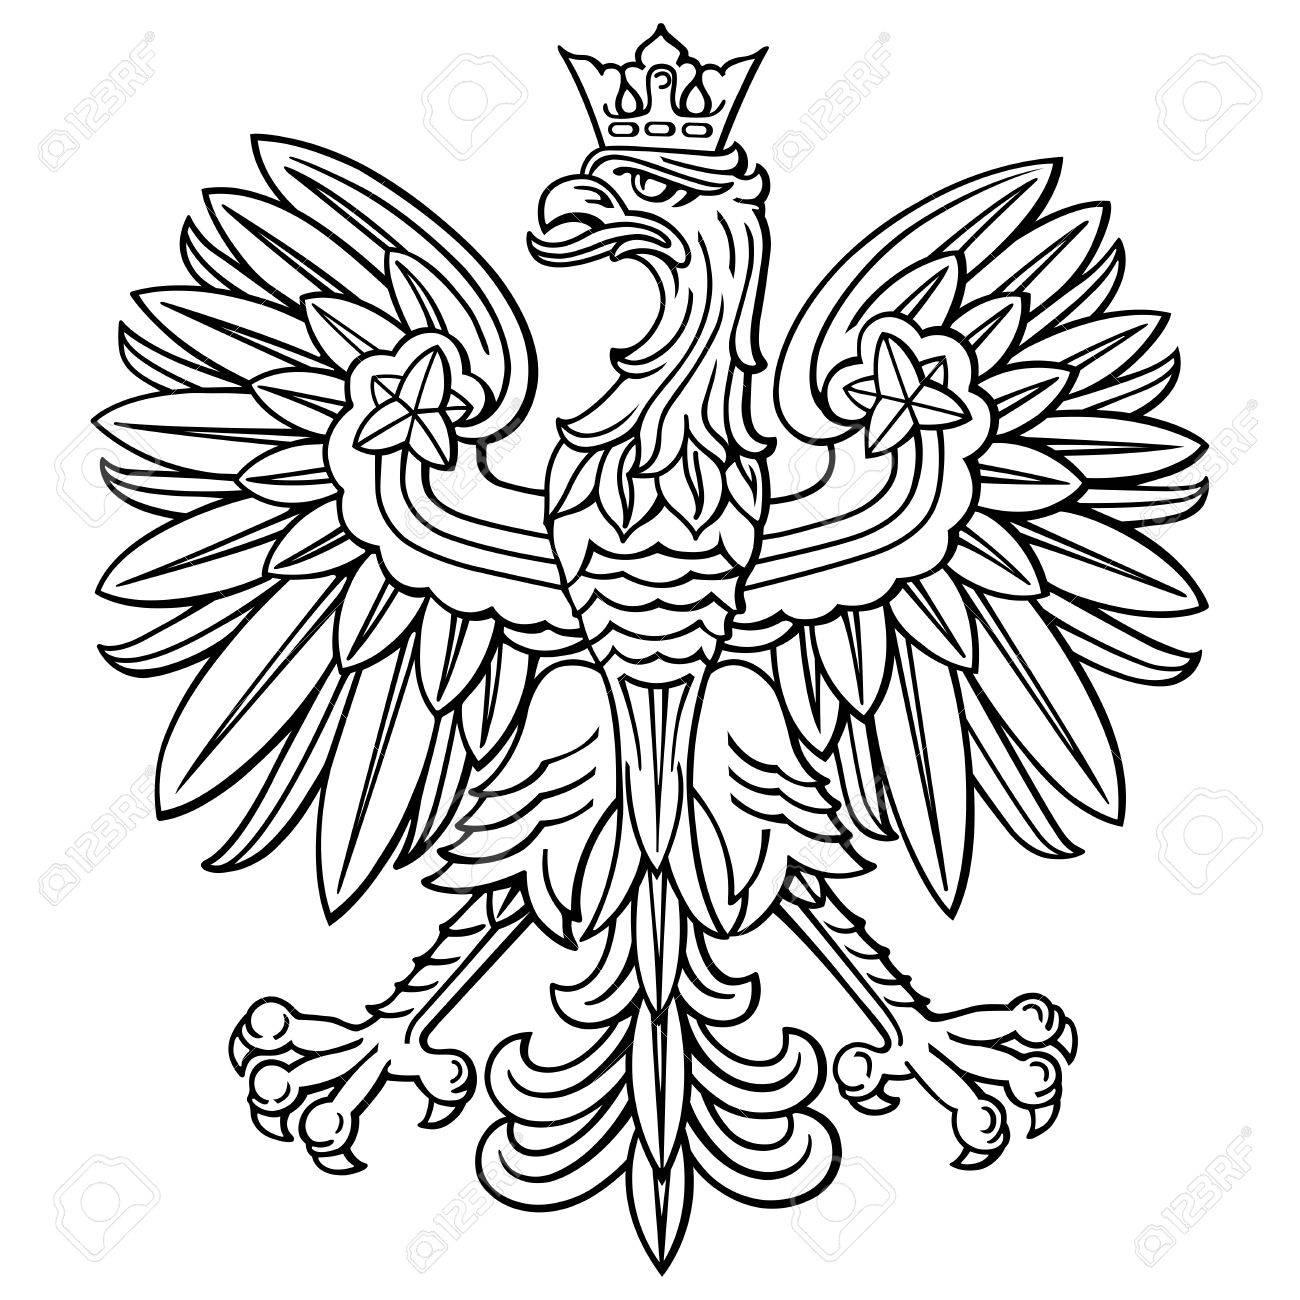 Poland eagle, polish national coat of arm, detailed vector illustration. - 85034996